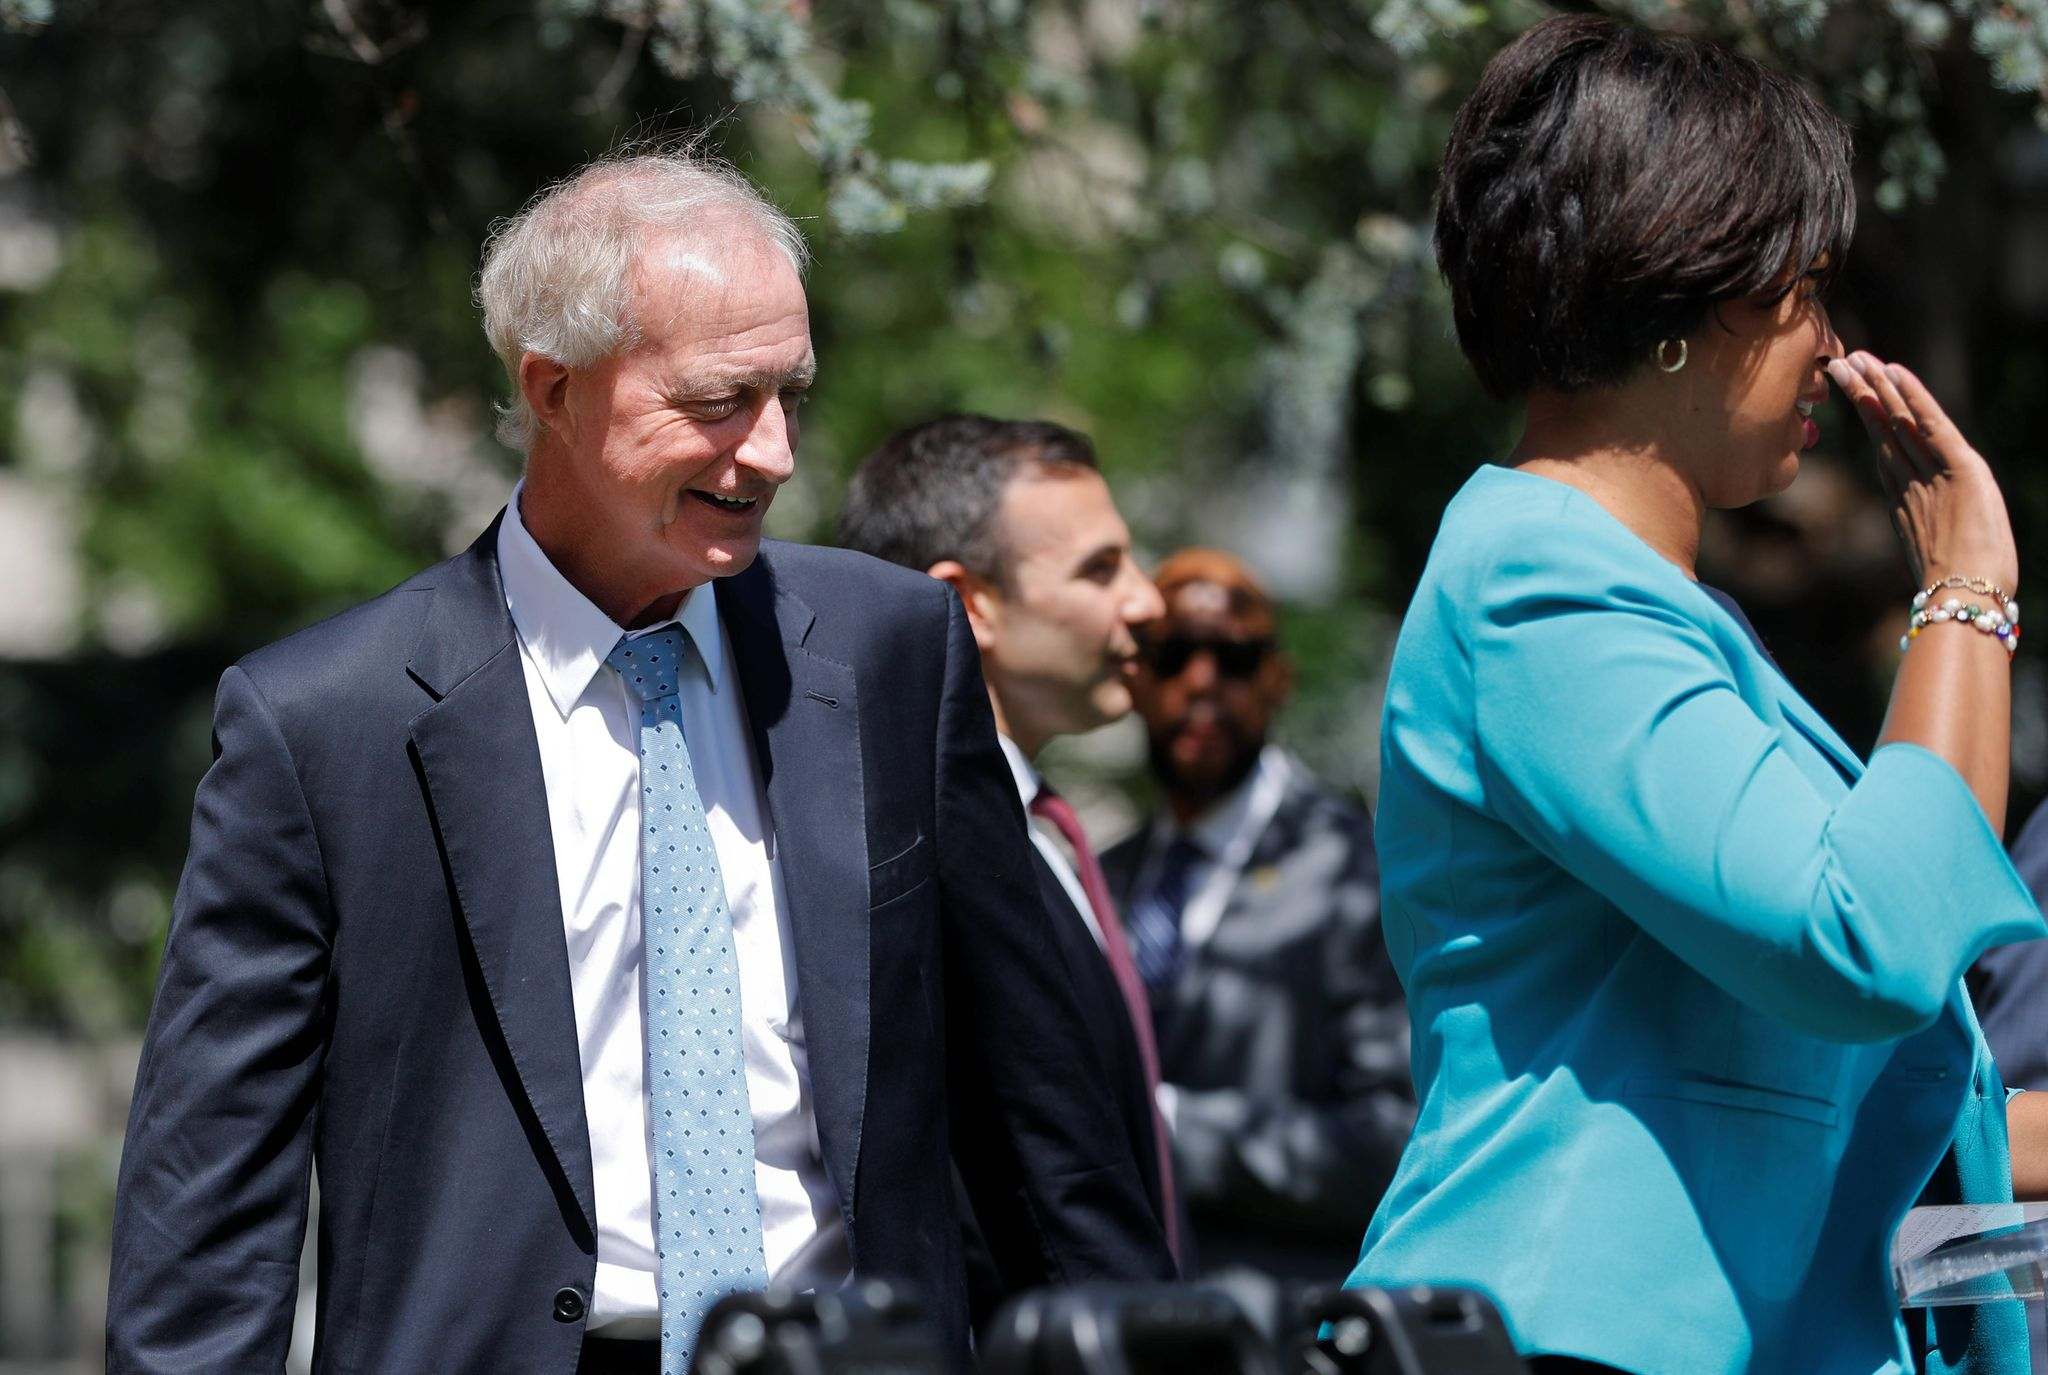 Congress' action in Jack Evans ethics probe casts shadow on D.C.'s statehood bid